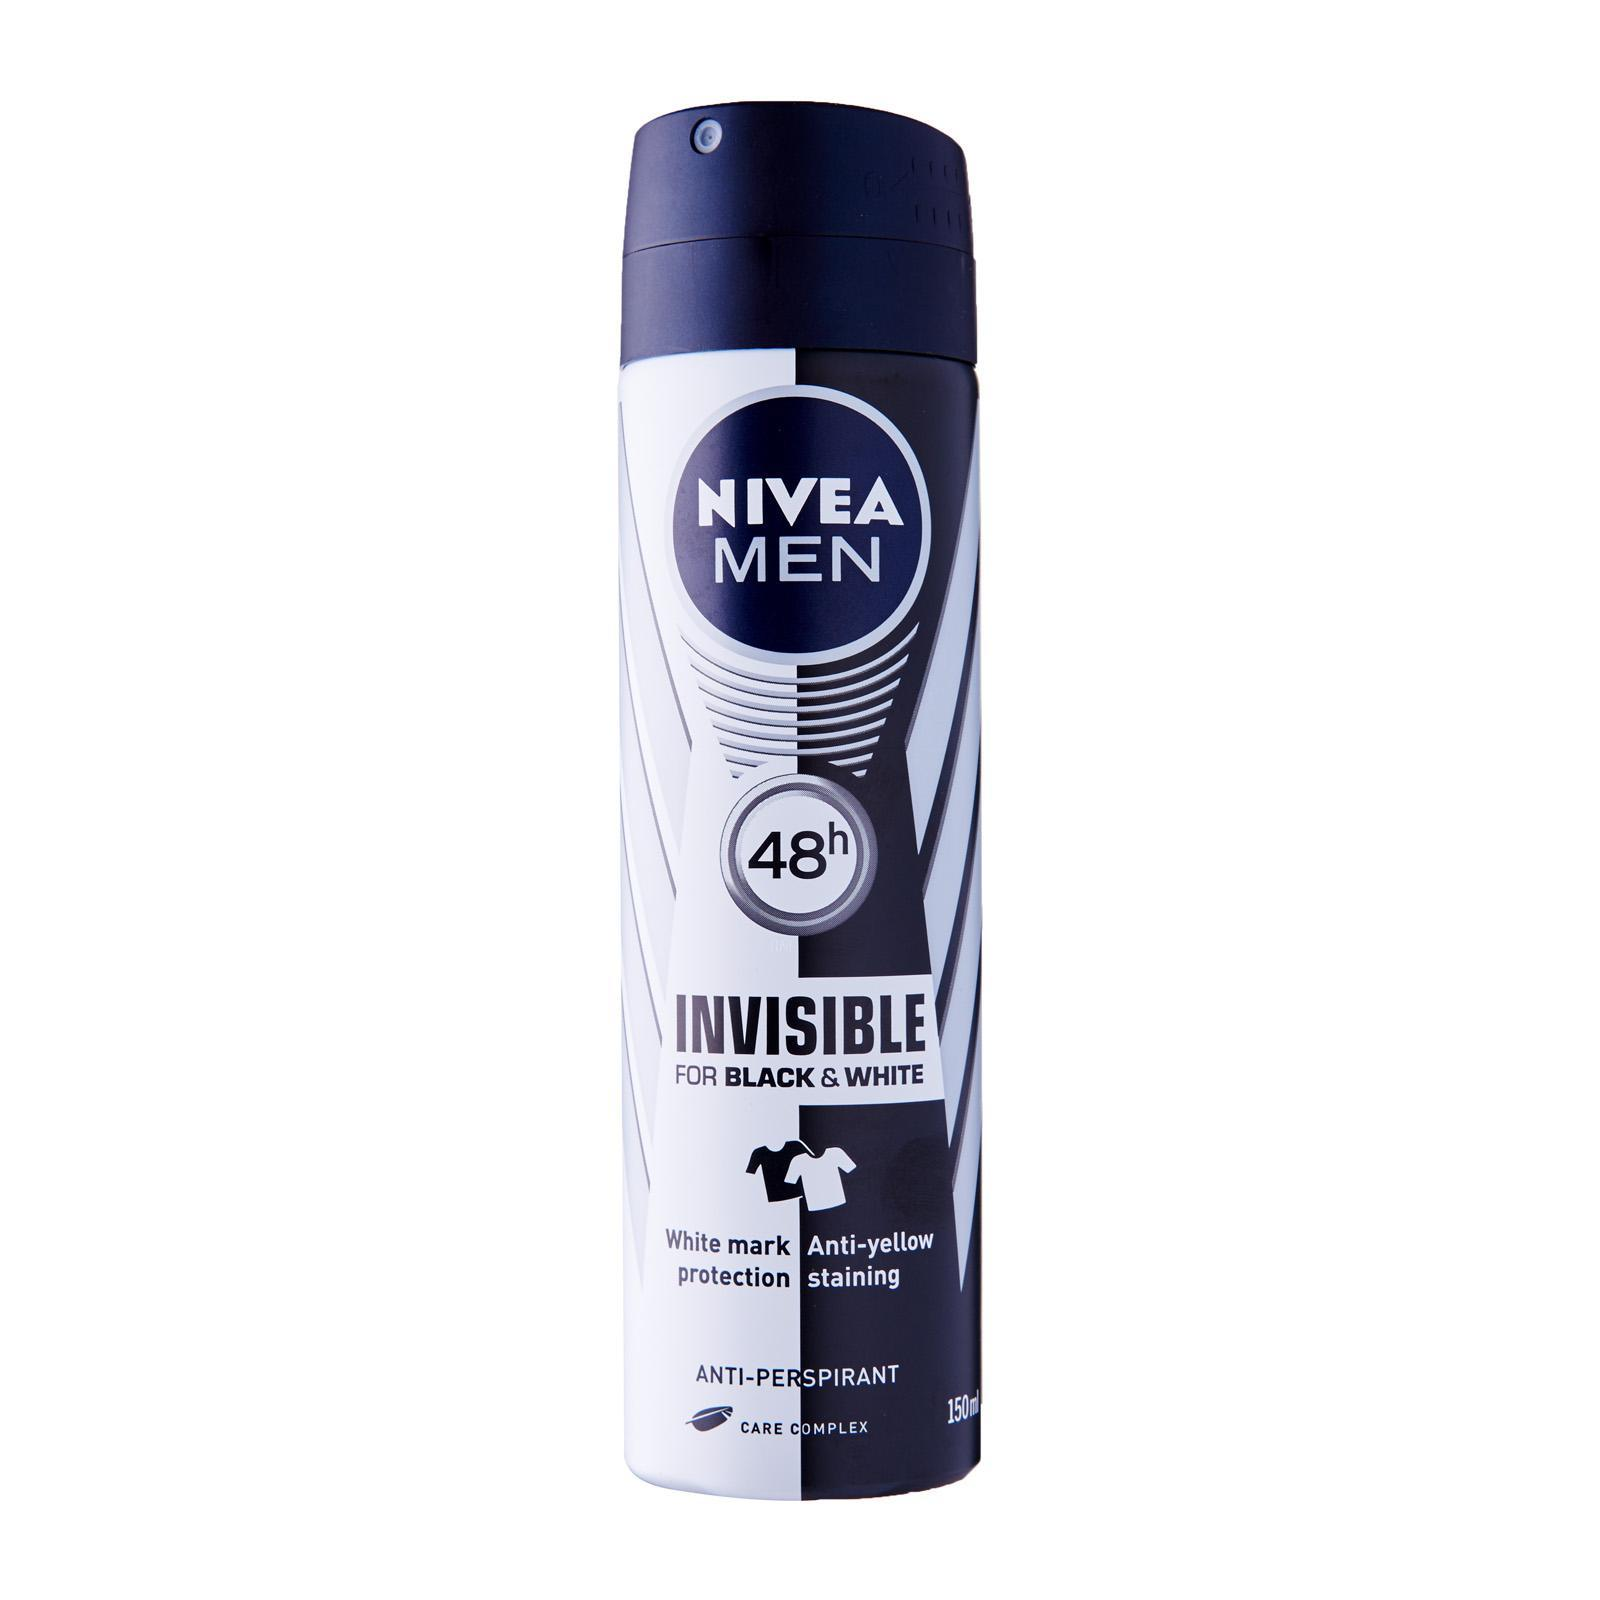 Nivea Deodorant for Men Spray Invisible Black and White (Power)